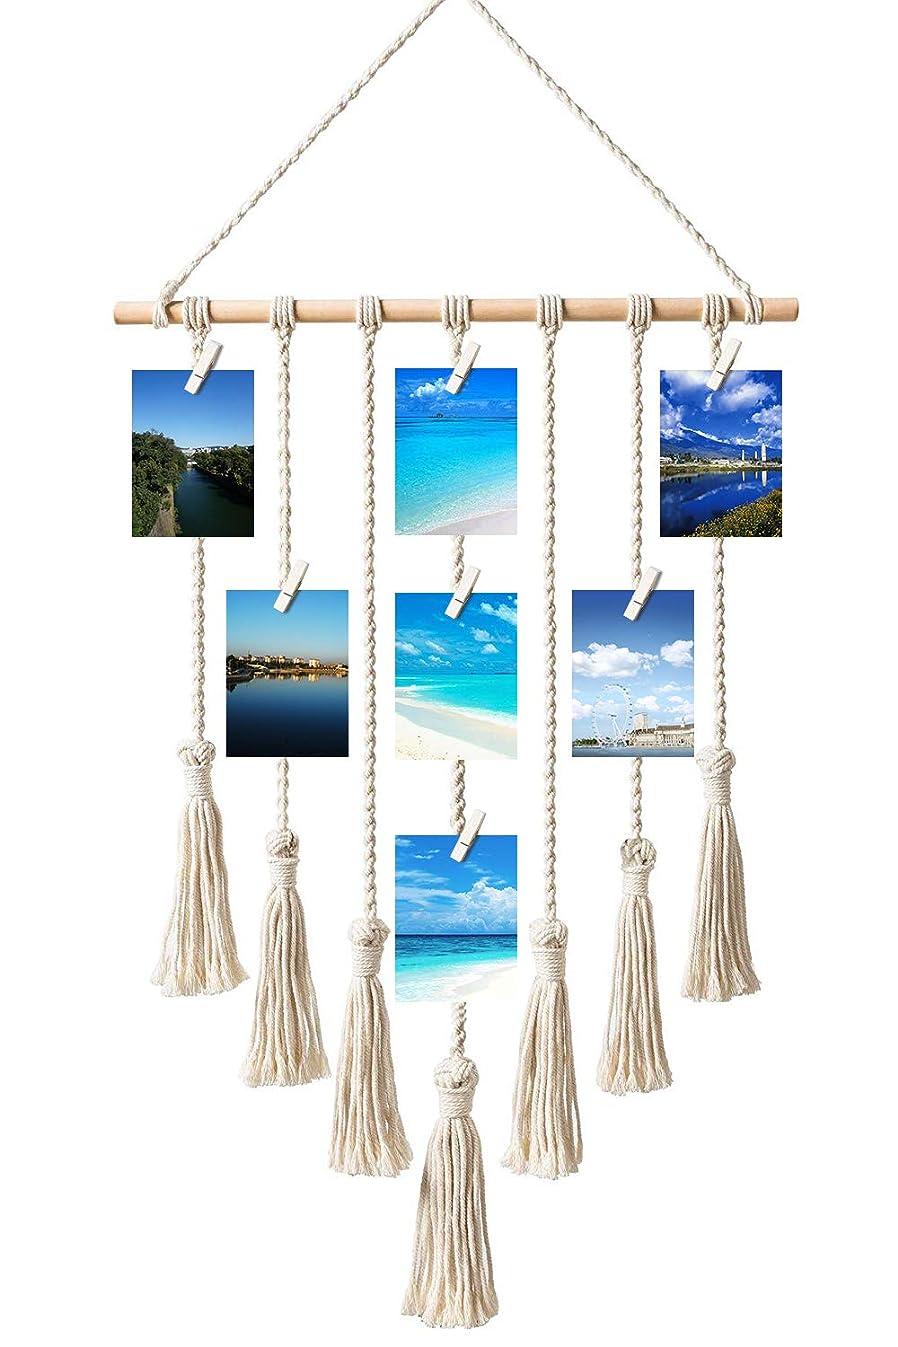 Toniya Hanging Photo Display Pictures Organizer Macrame Wall Bohemian Home Decor,with 30 Wood Clips